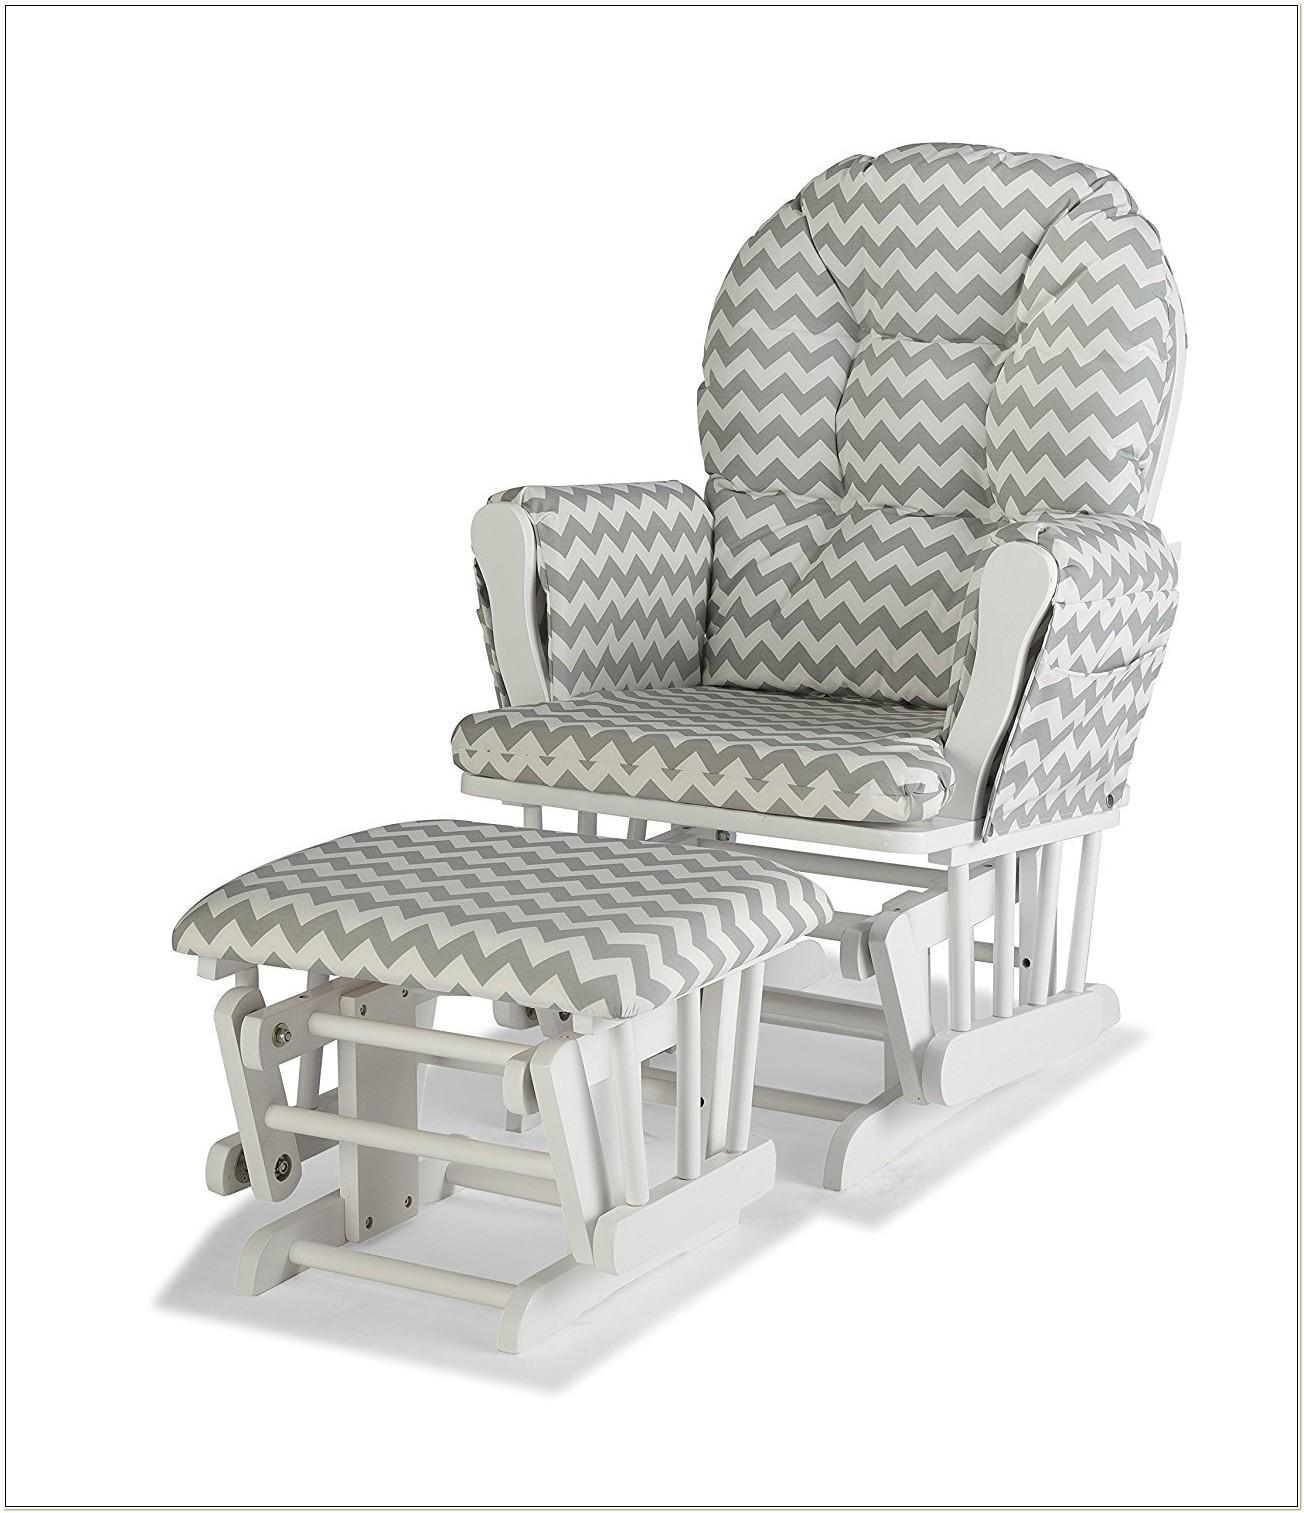 Stork Craft Rocking Chair Cushions